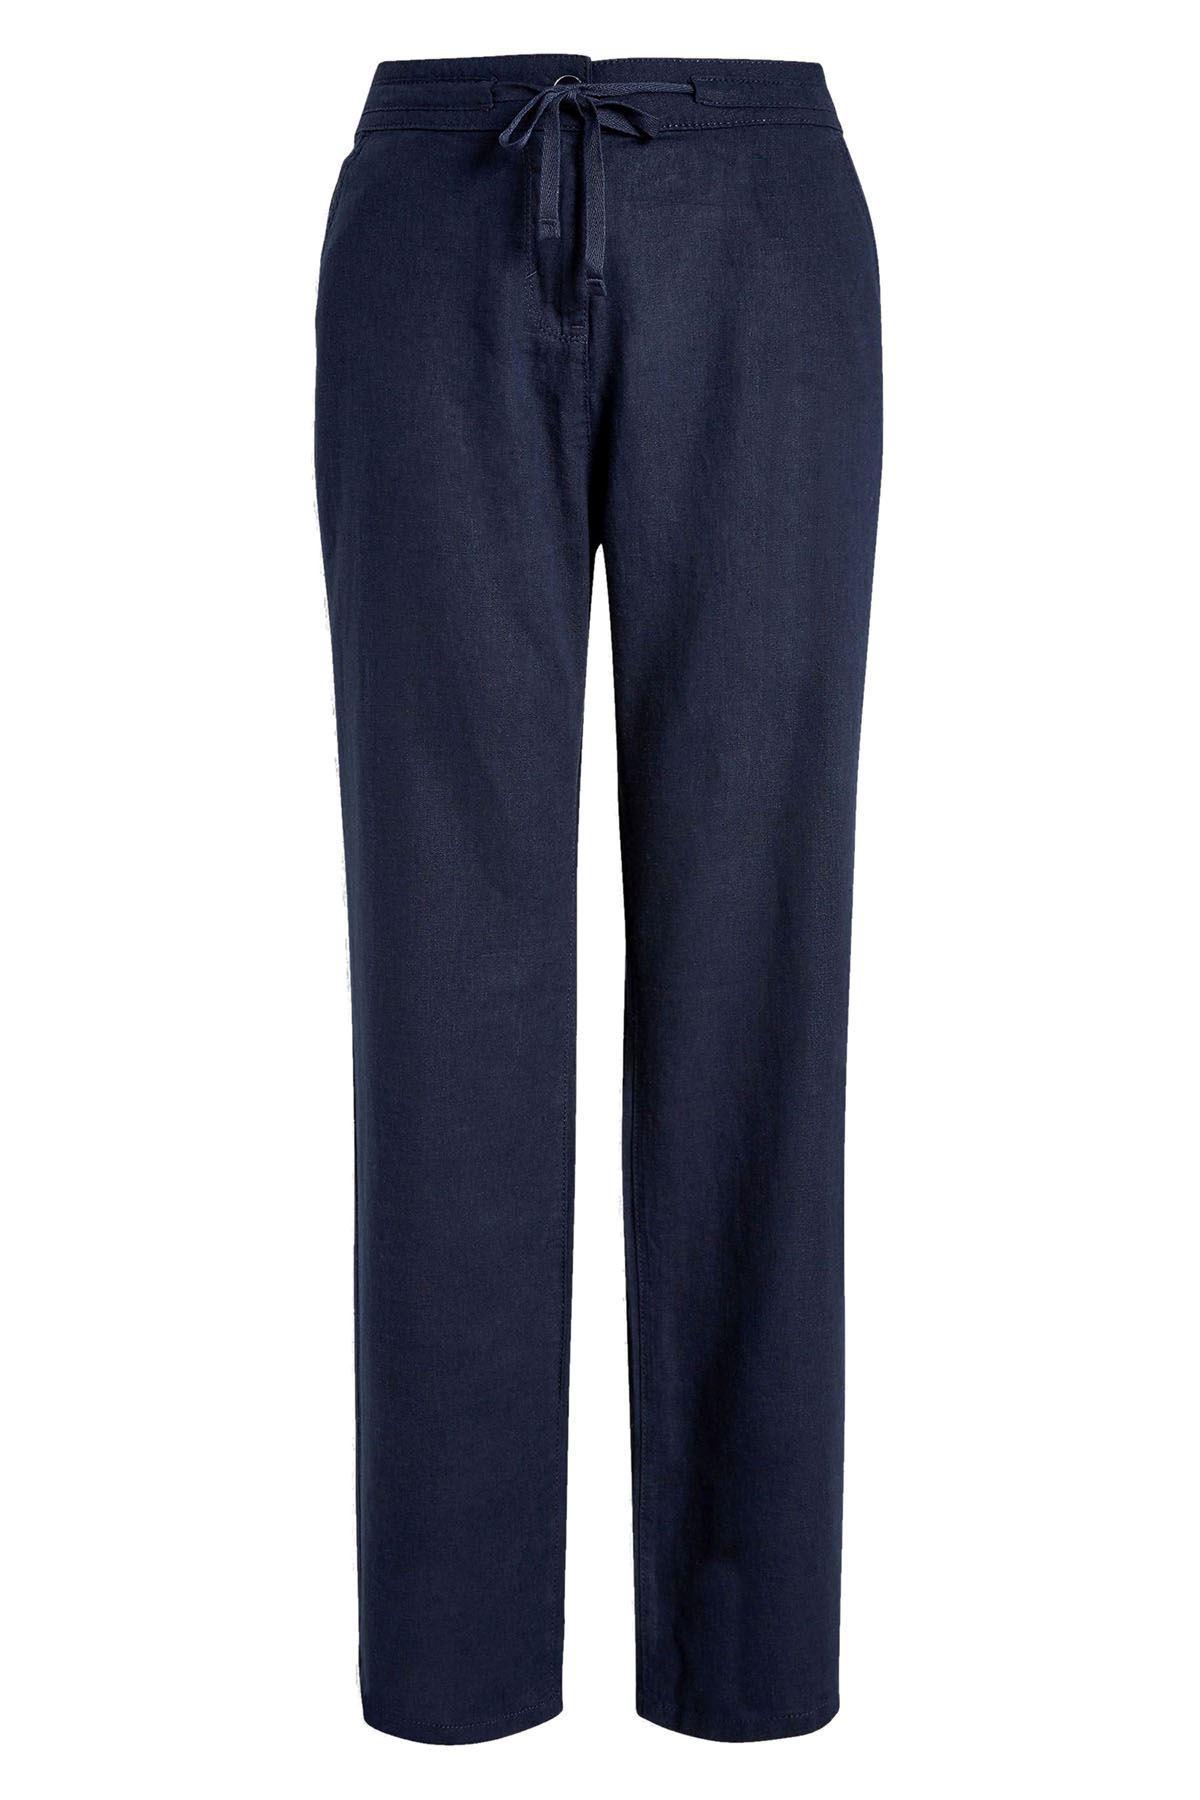 NEXT Linen Drawstring Straight Leg Casual TrousersSALEWas £22